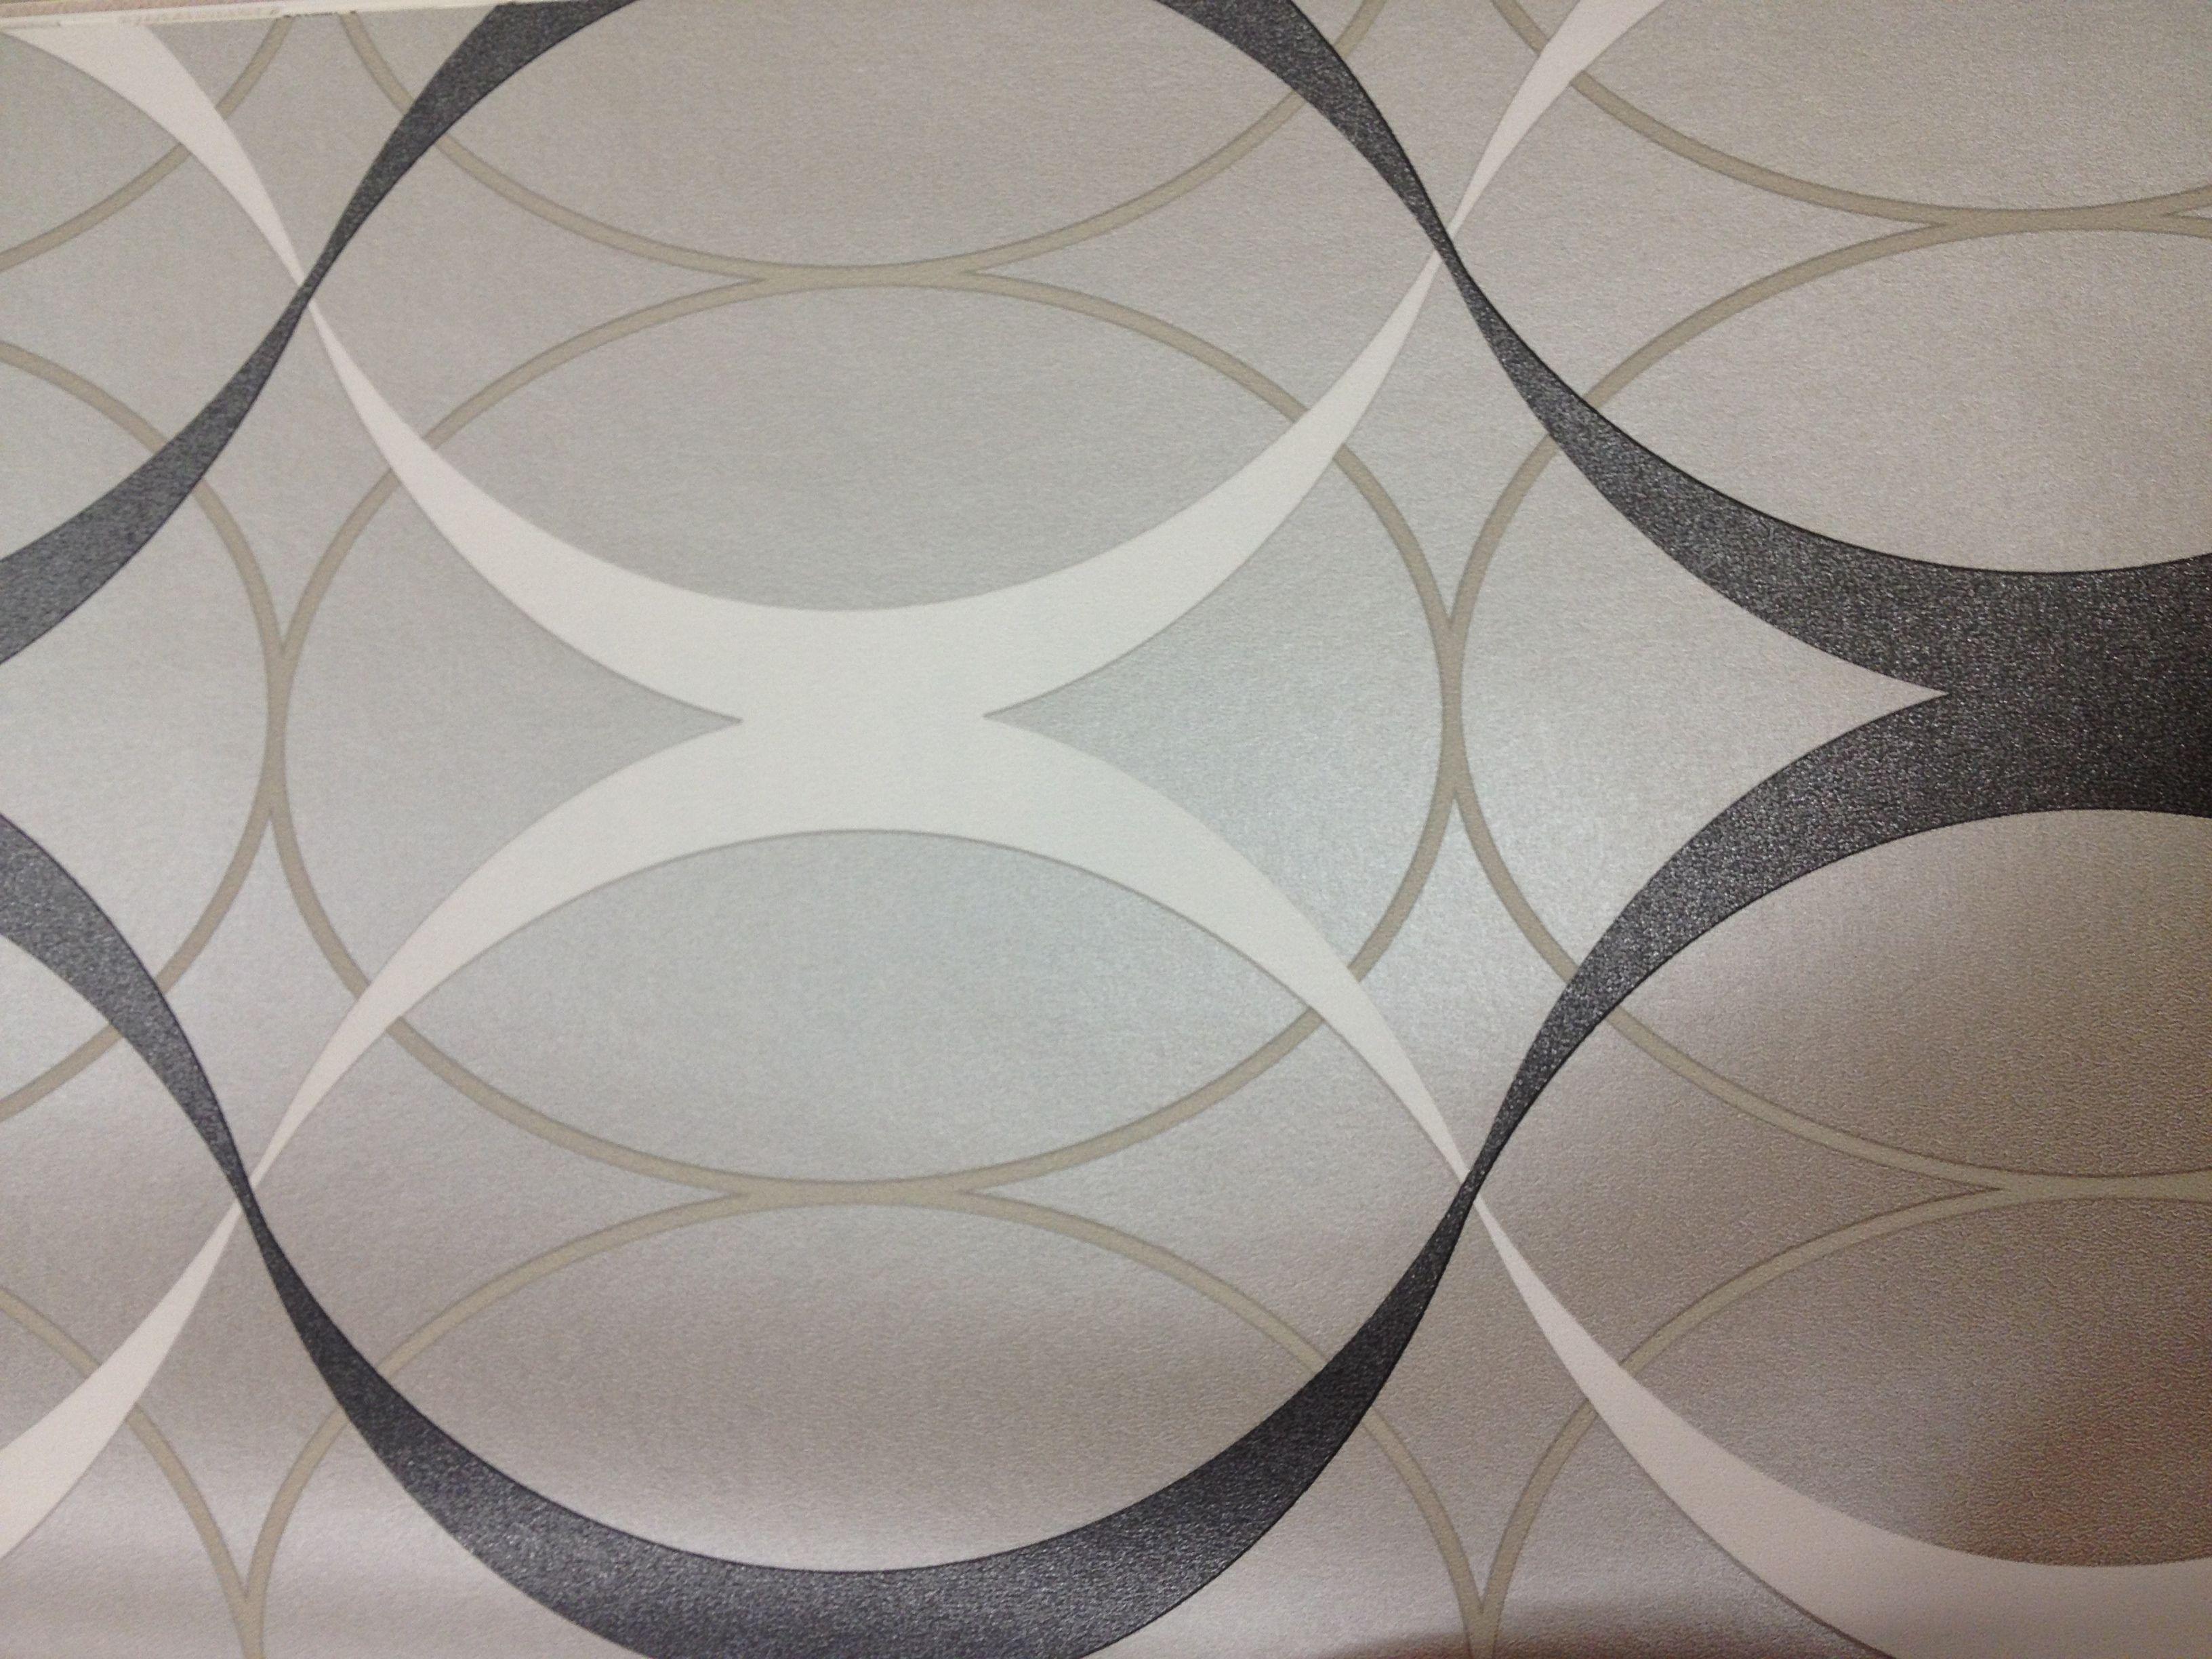 Sherwin Williams Wallpaper Wallpaper Wallpaper Decor Removable Wallpaper